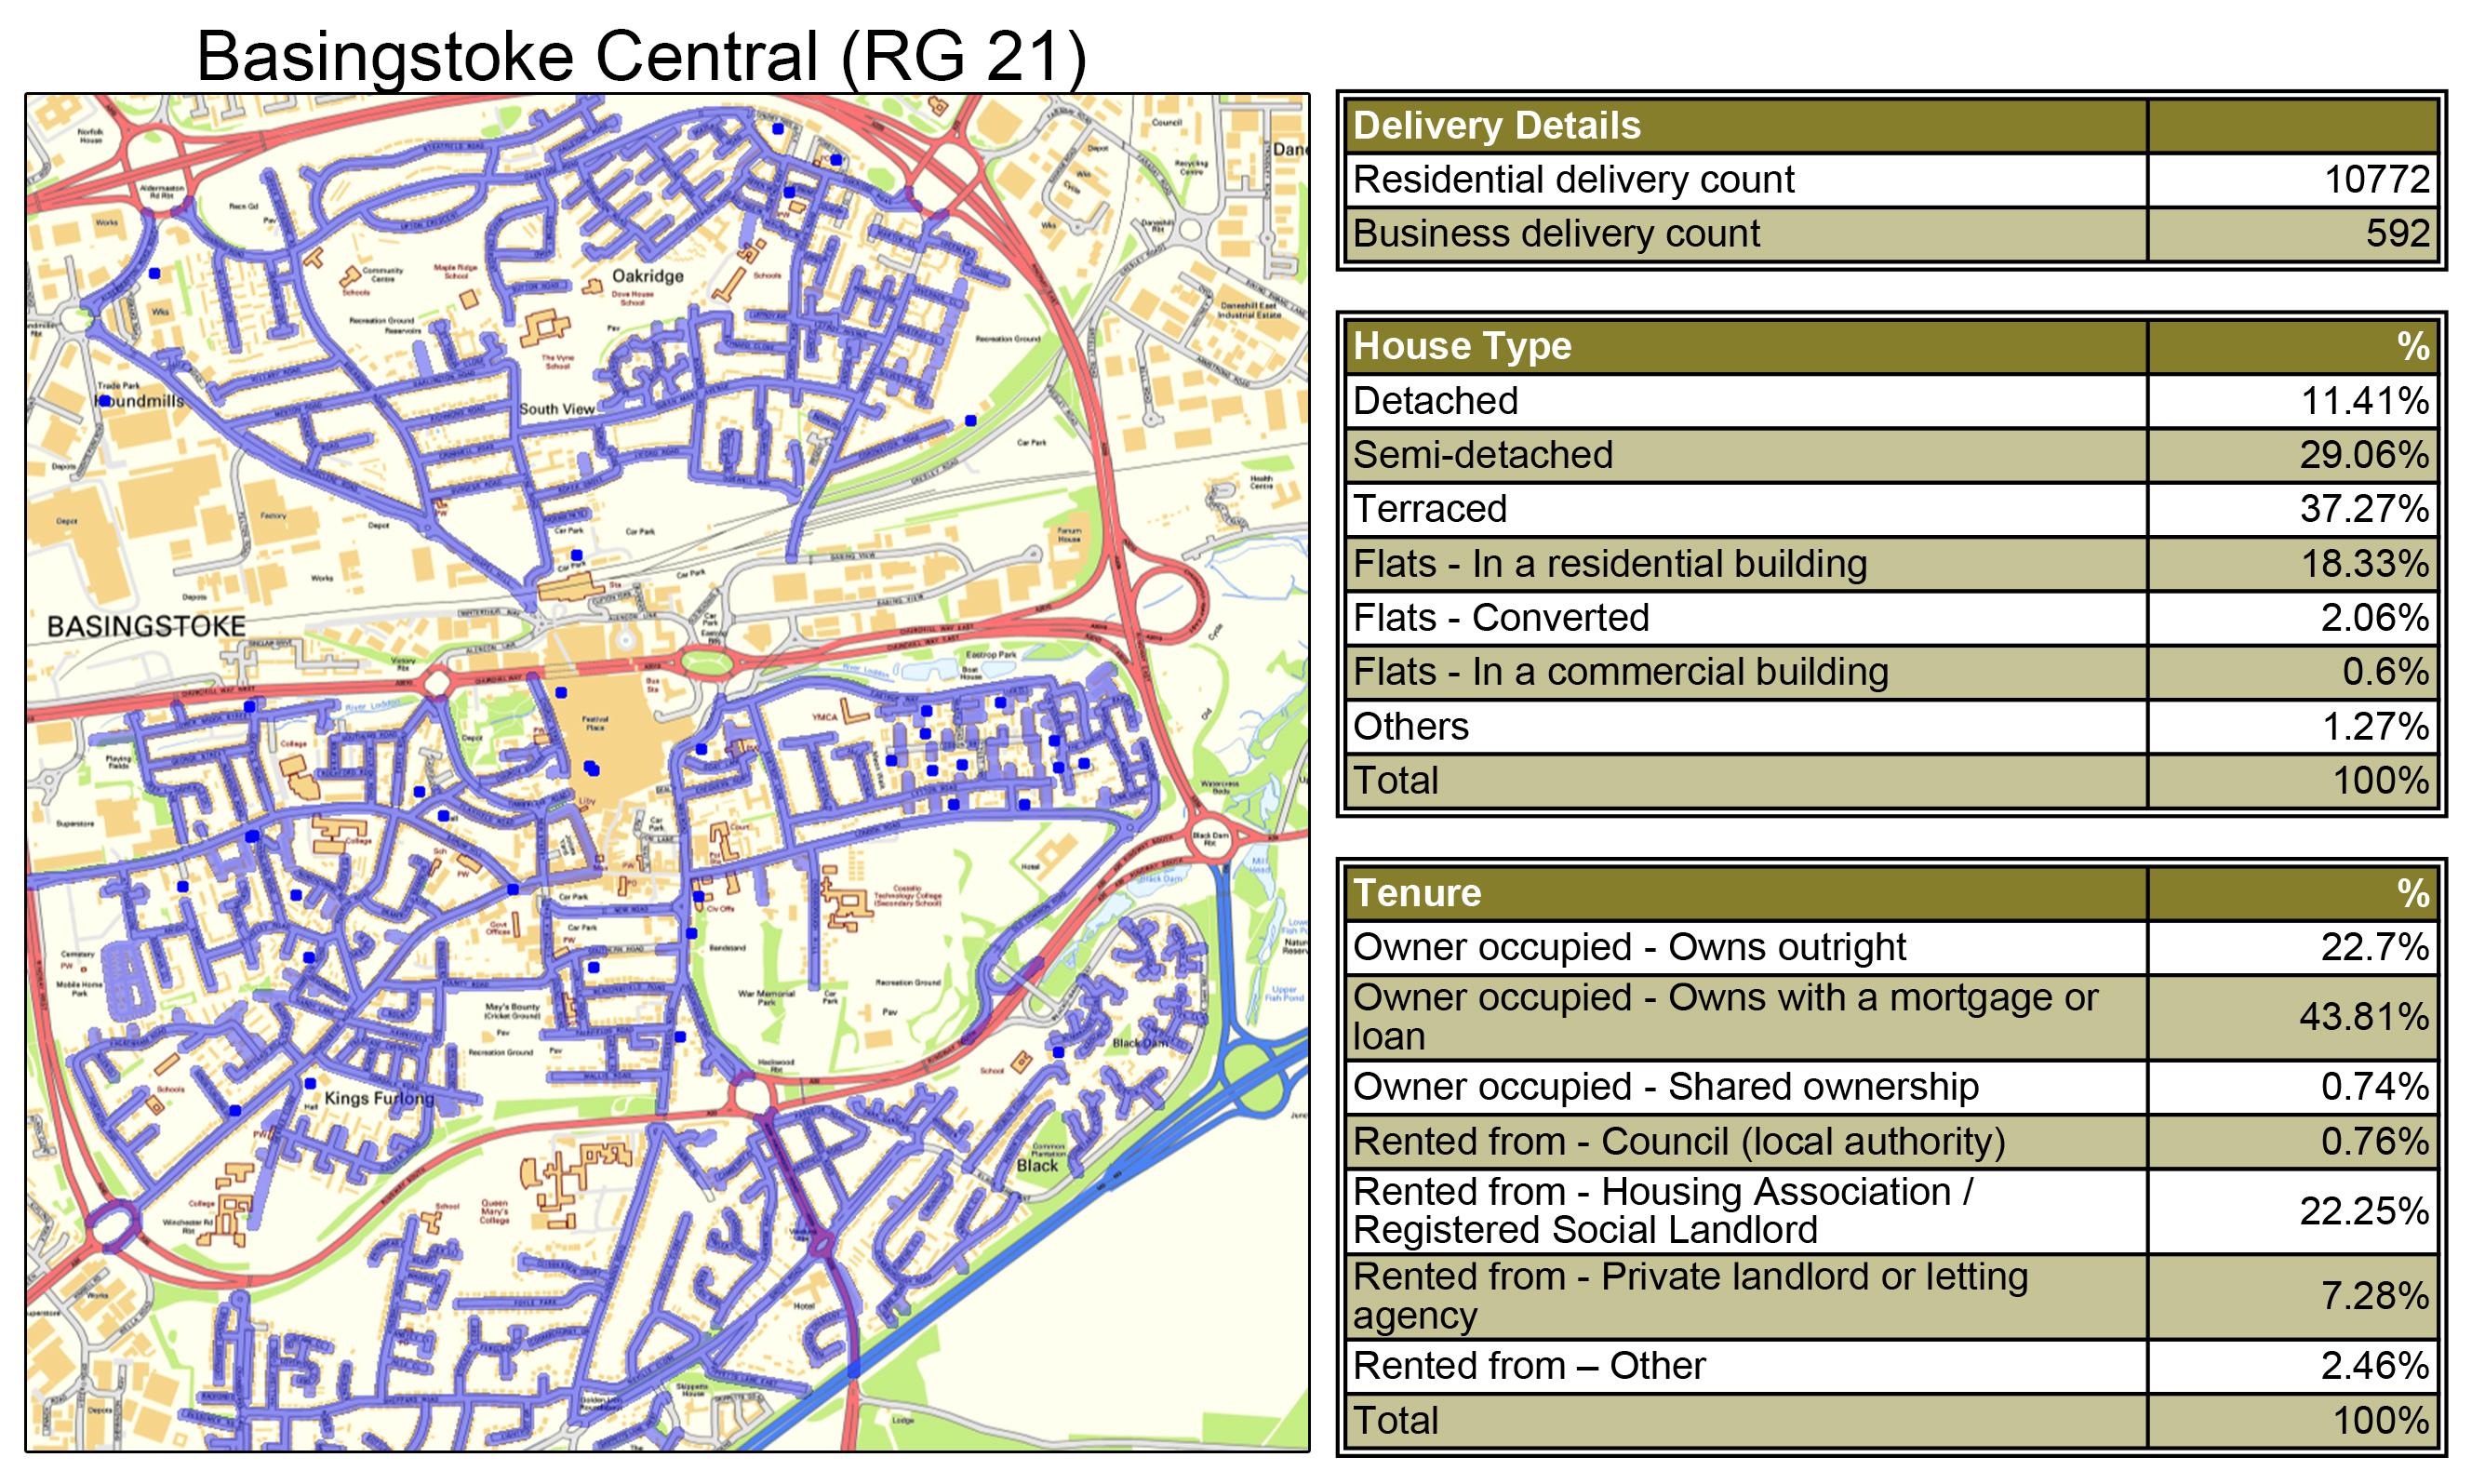 Leaflet Distribution Basingstoke - Geoplan Image